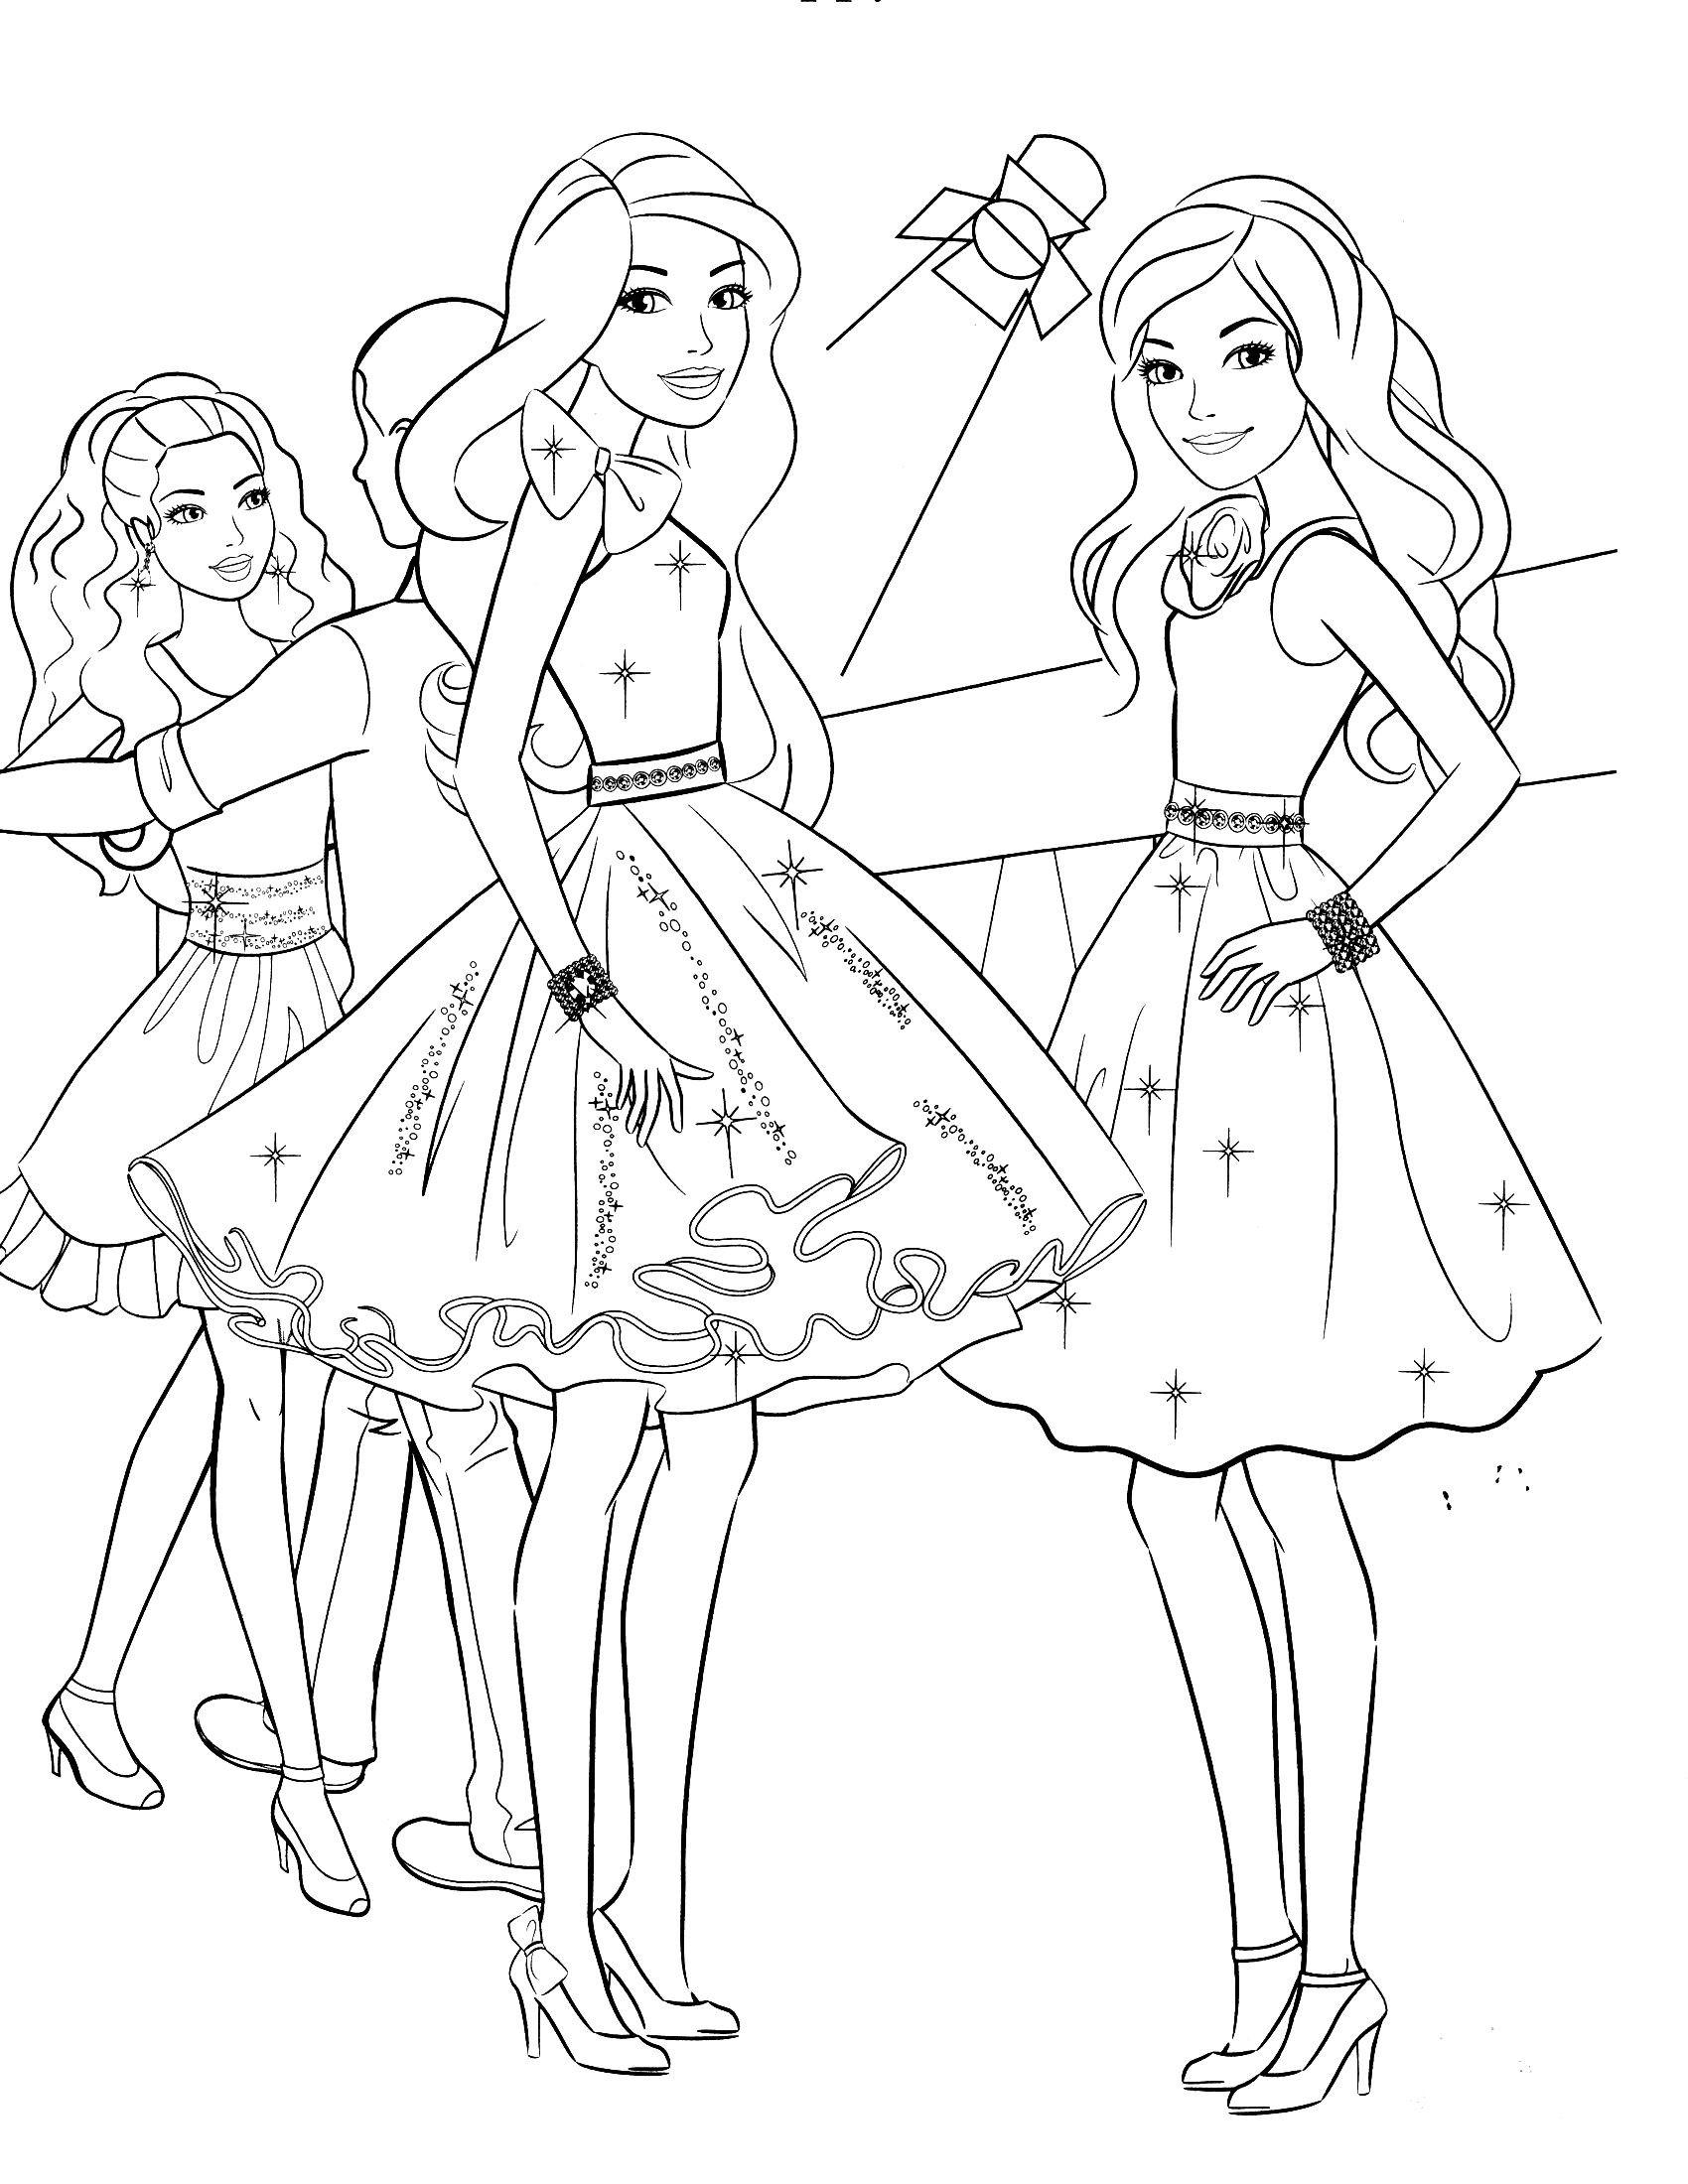 Ausmalbilder Barbie Prinzessin Einzigartig Free Coloring Pages for Kids Coloring Time Bilder